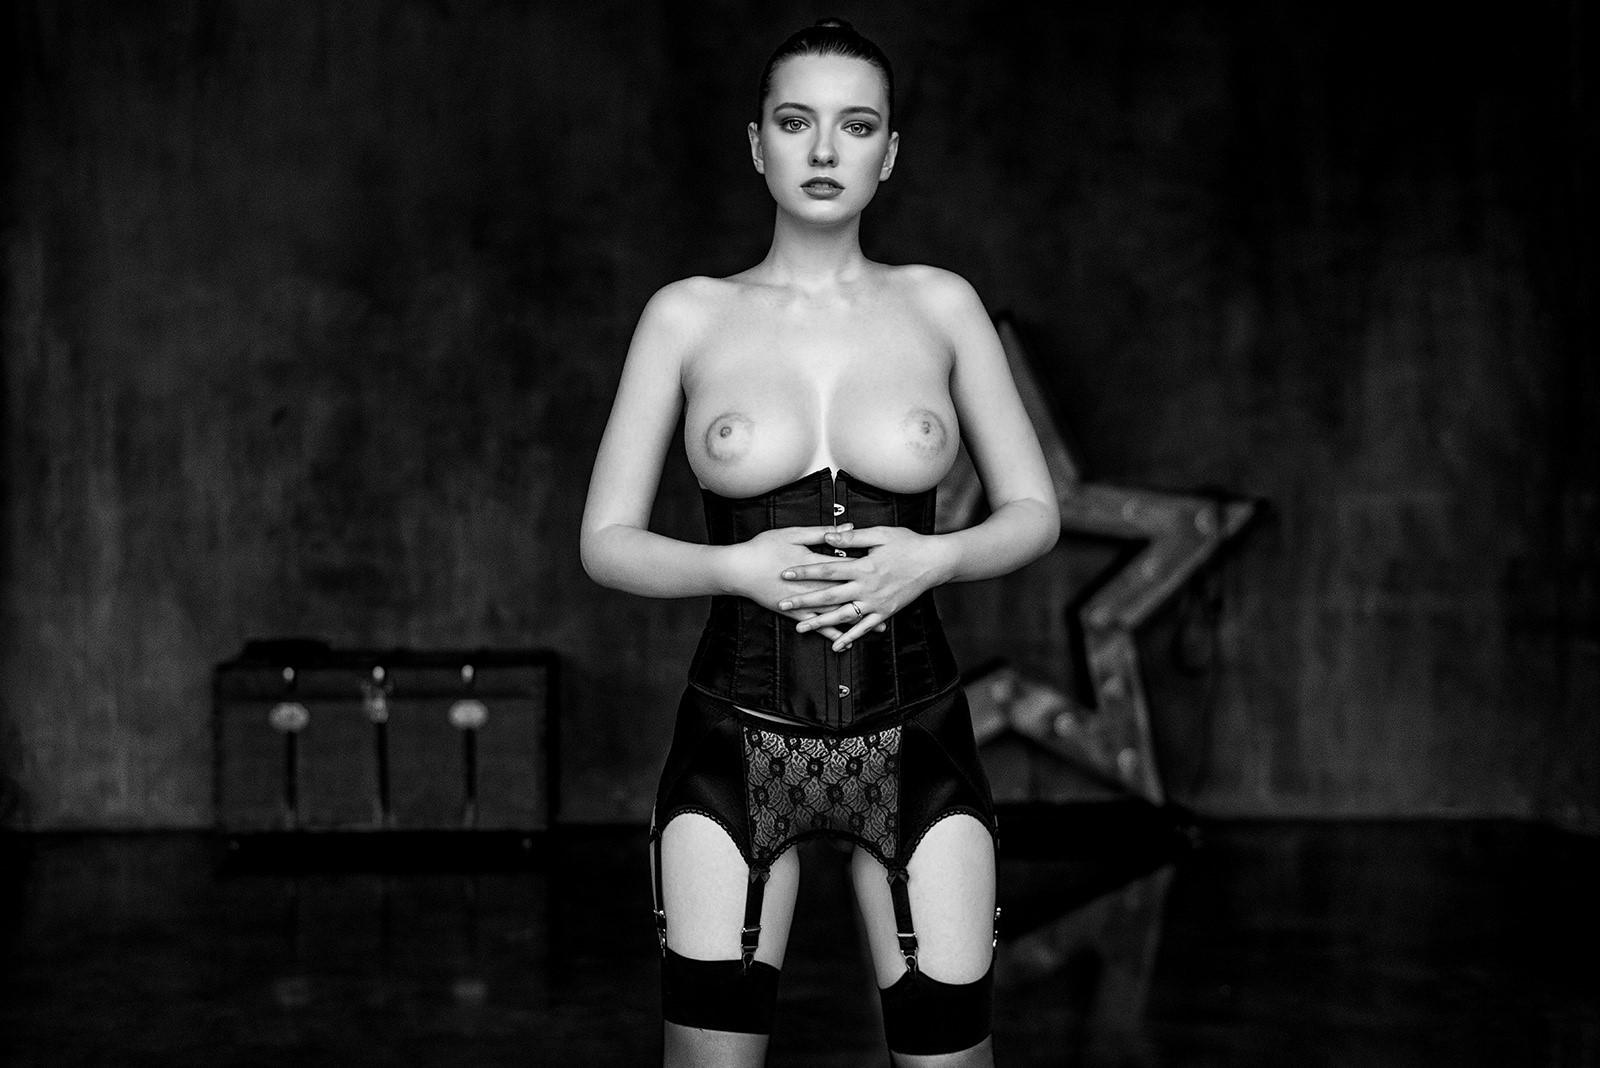 Amy Nude Pics amy tsareva nude photos (6) - dirtyship